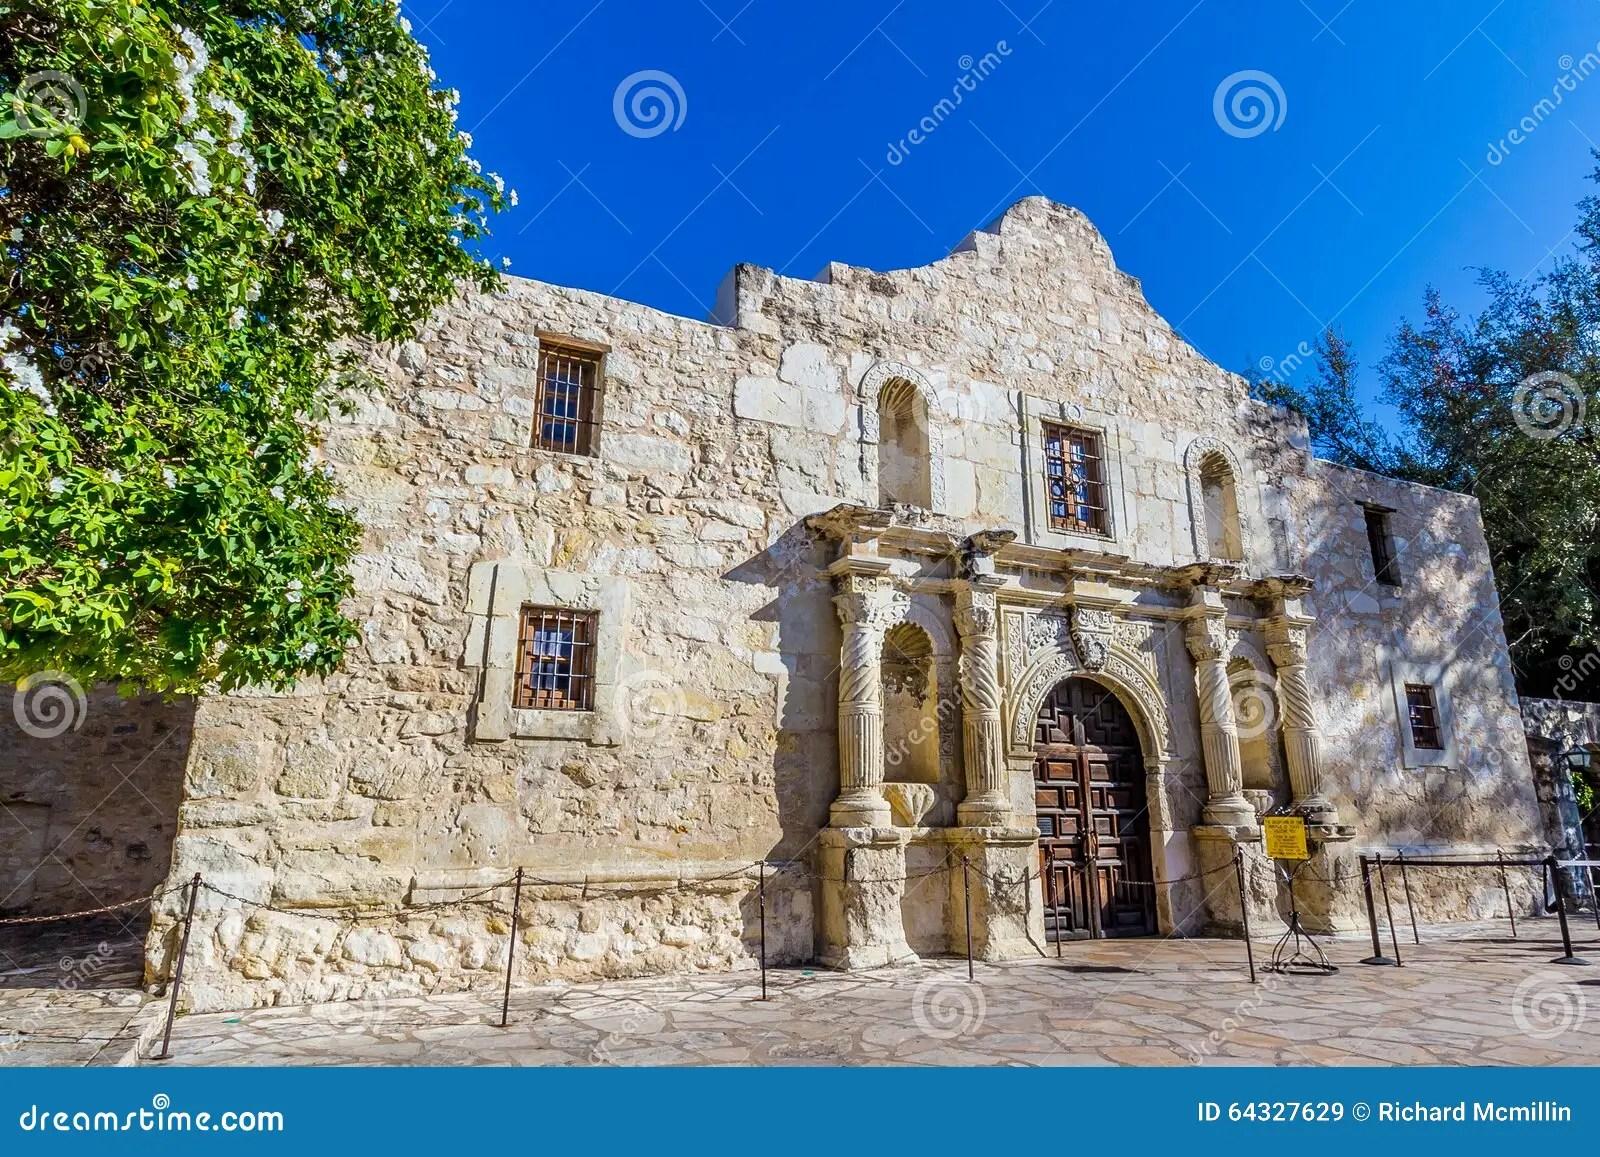 The Historic Alamo In Texas Stock Photo